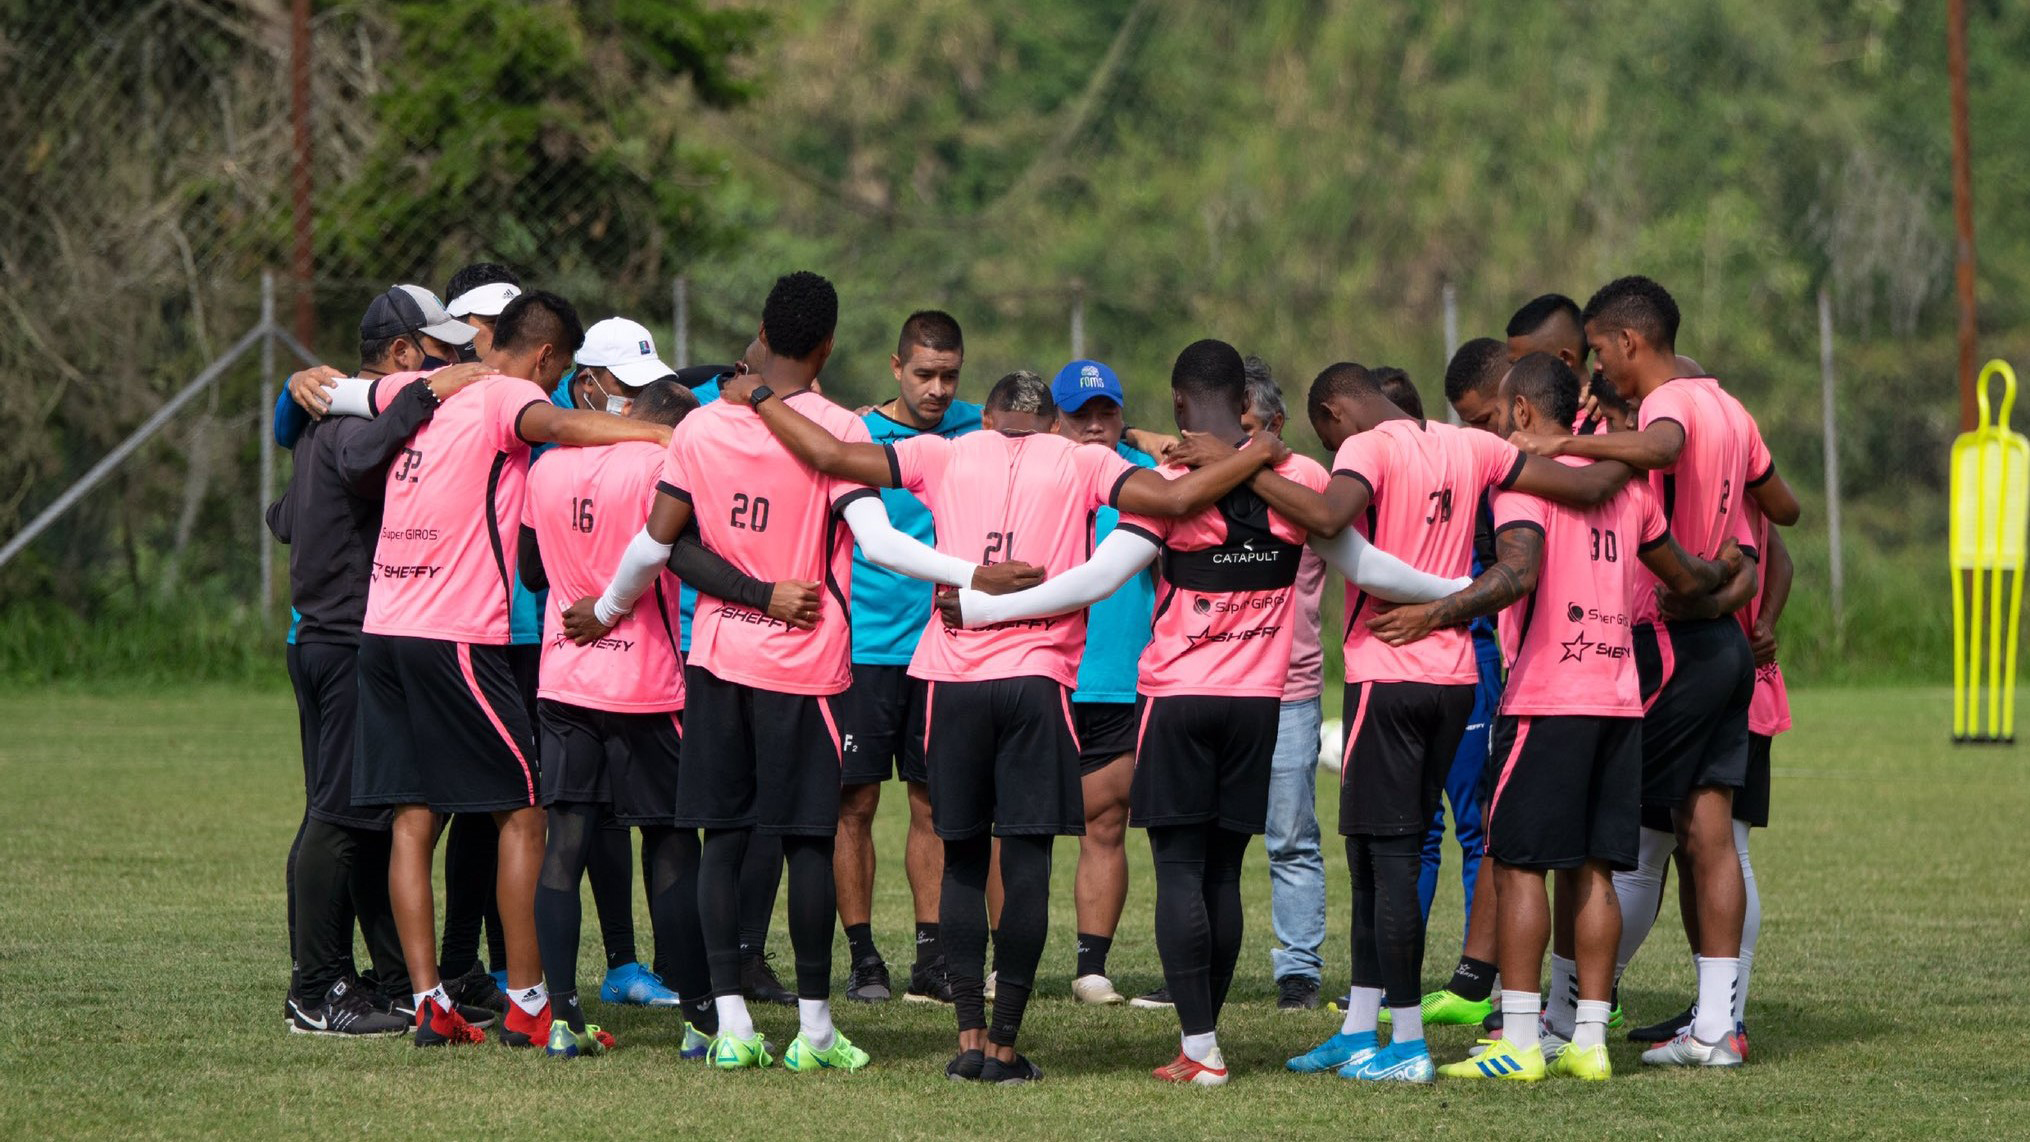 Once-Caldas-2-1-Boyaca-Chicó-Copa-Postobon-Casa-Blanca-OC-1